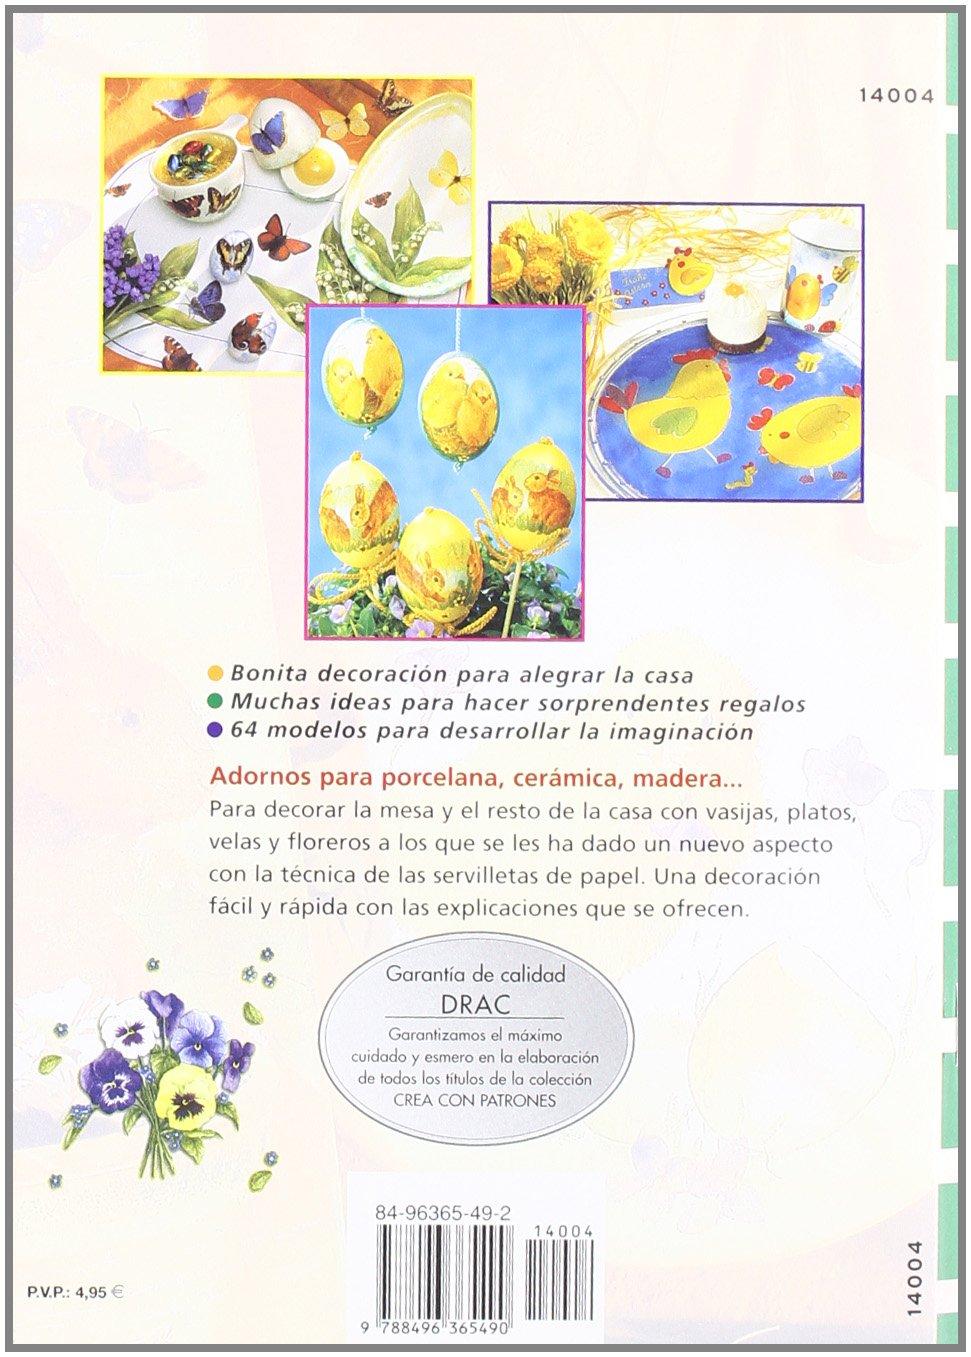 Servilletas de papel para decorar porcelana, cerámica, madera, cartón, huevos--: Erika Bock: 9788496365490: Amazon.com: Books